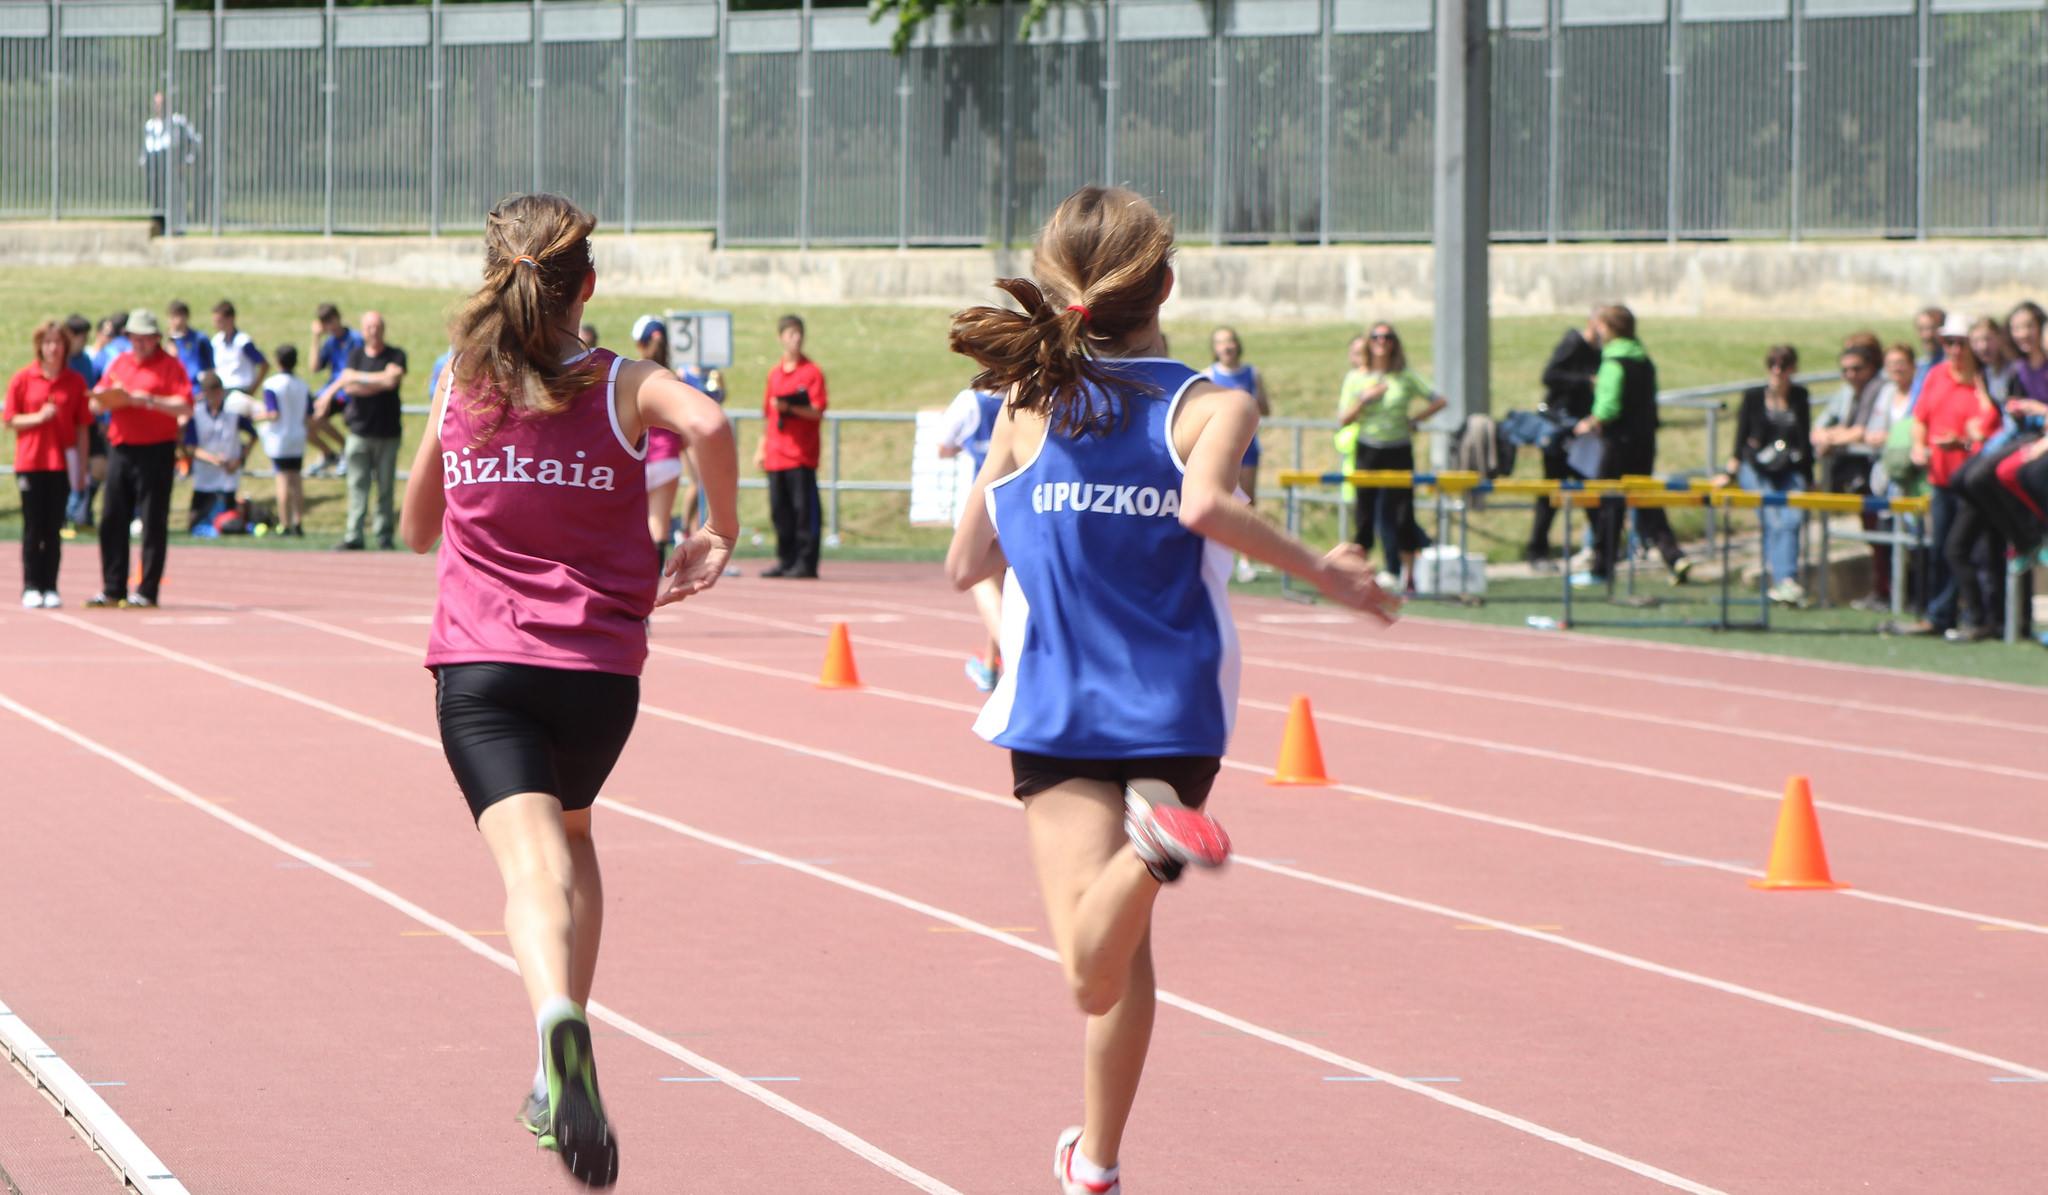 atletismoa_2014_02.jpg